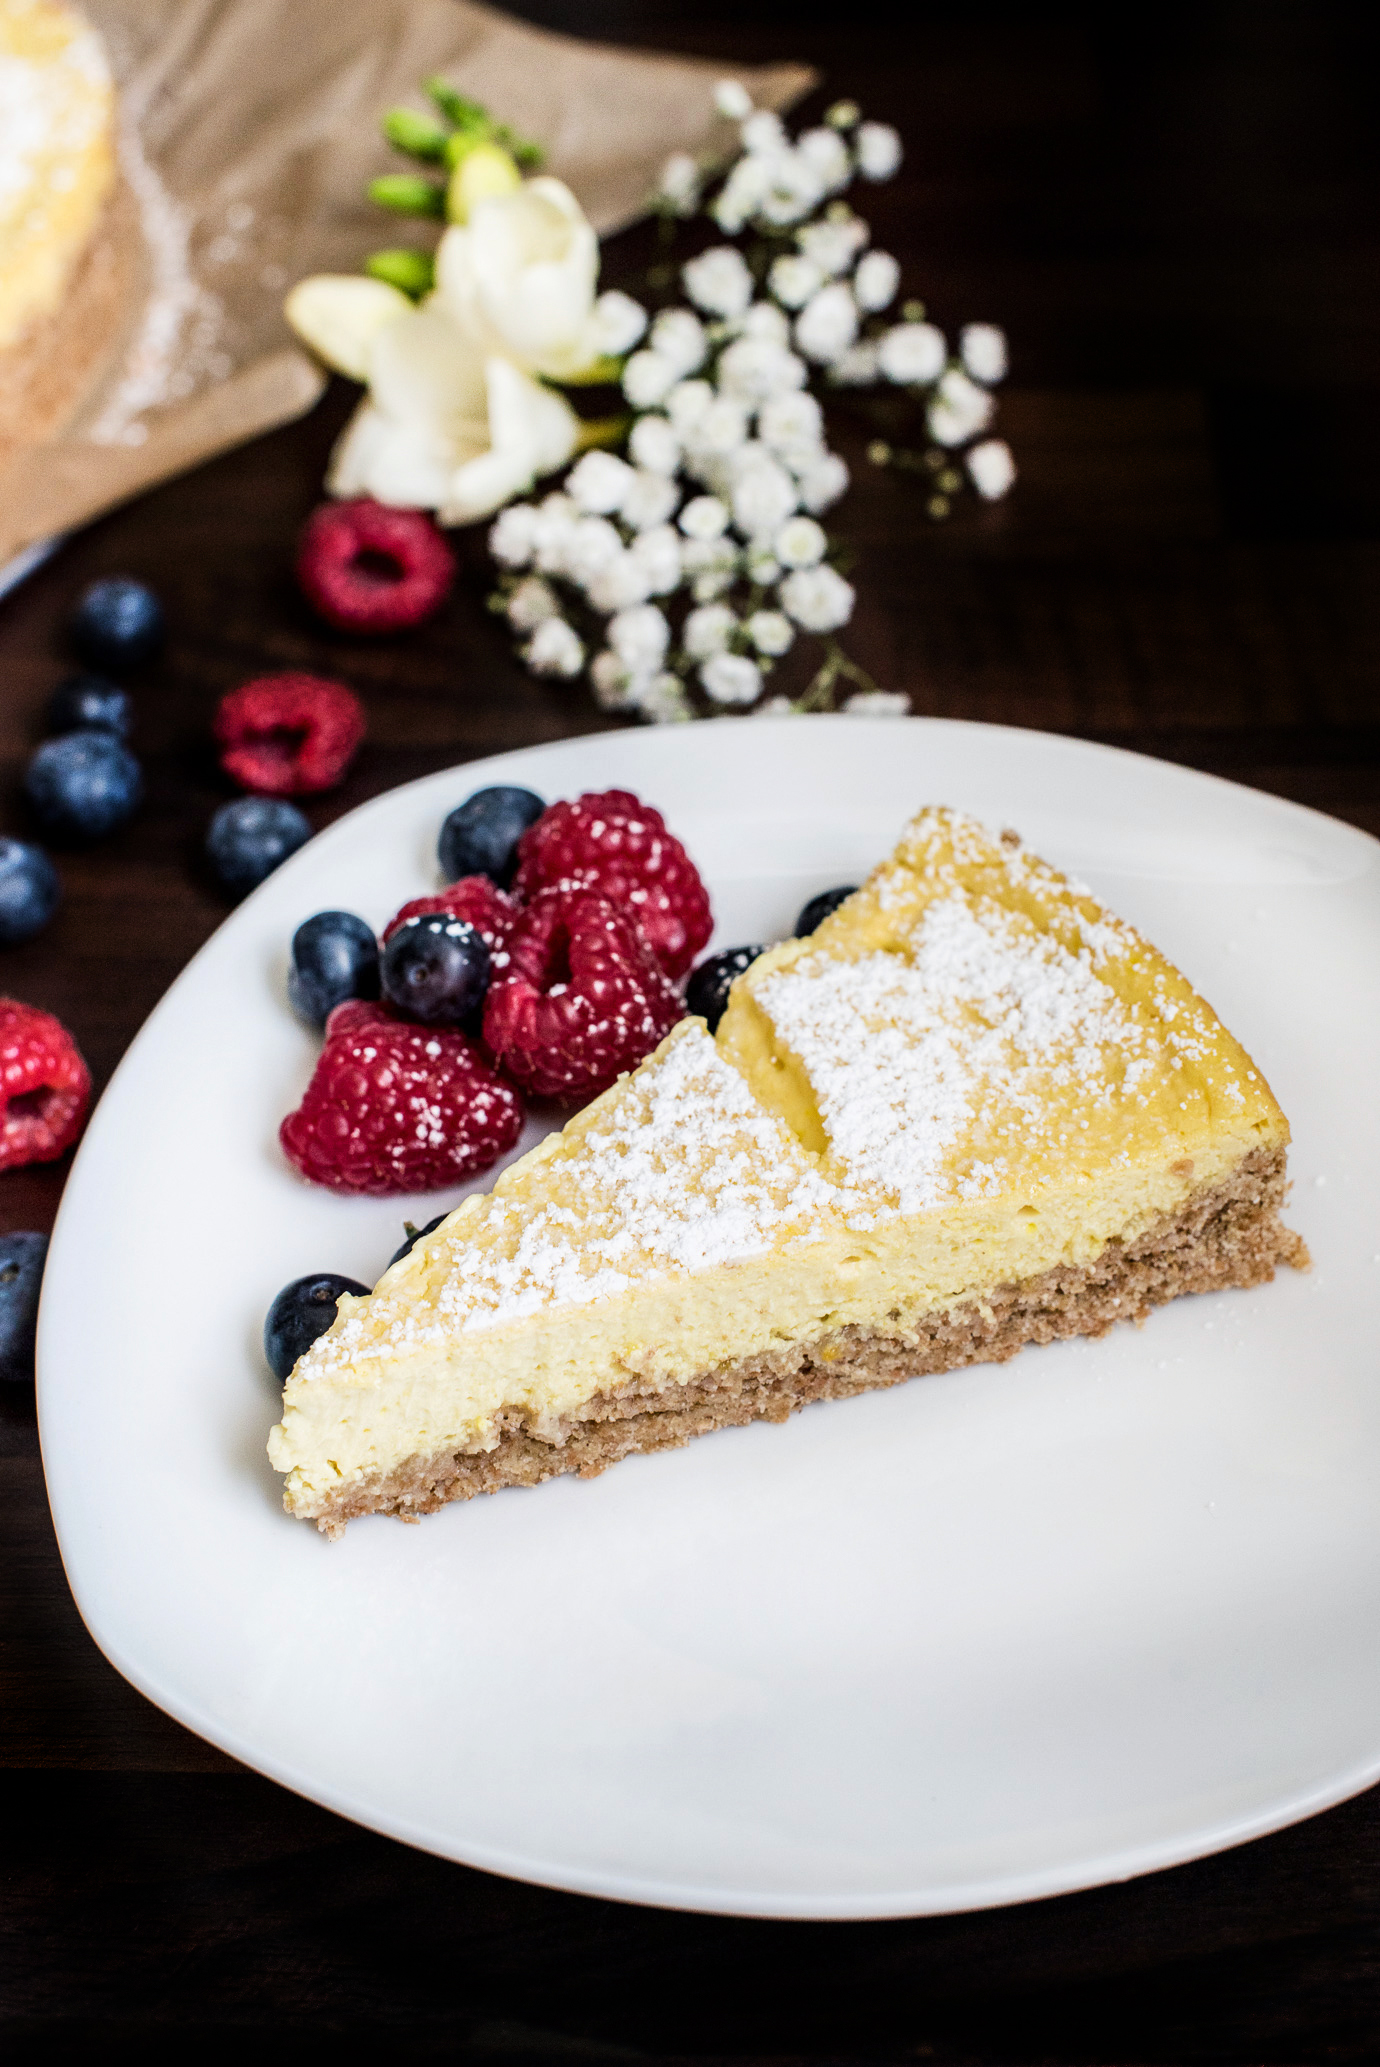 vegan_cheesecake_recipe_veganer_käsekuchen_rezept_5